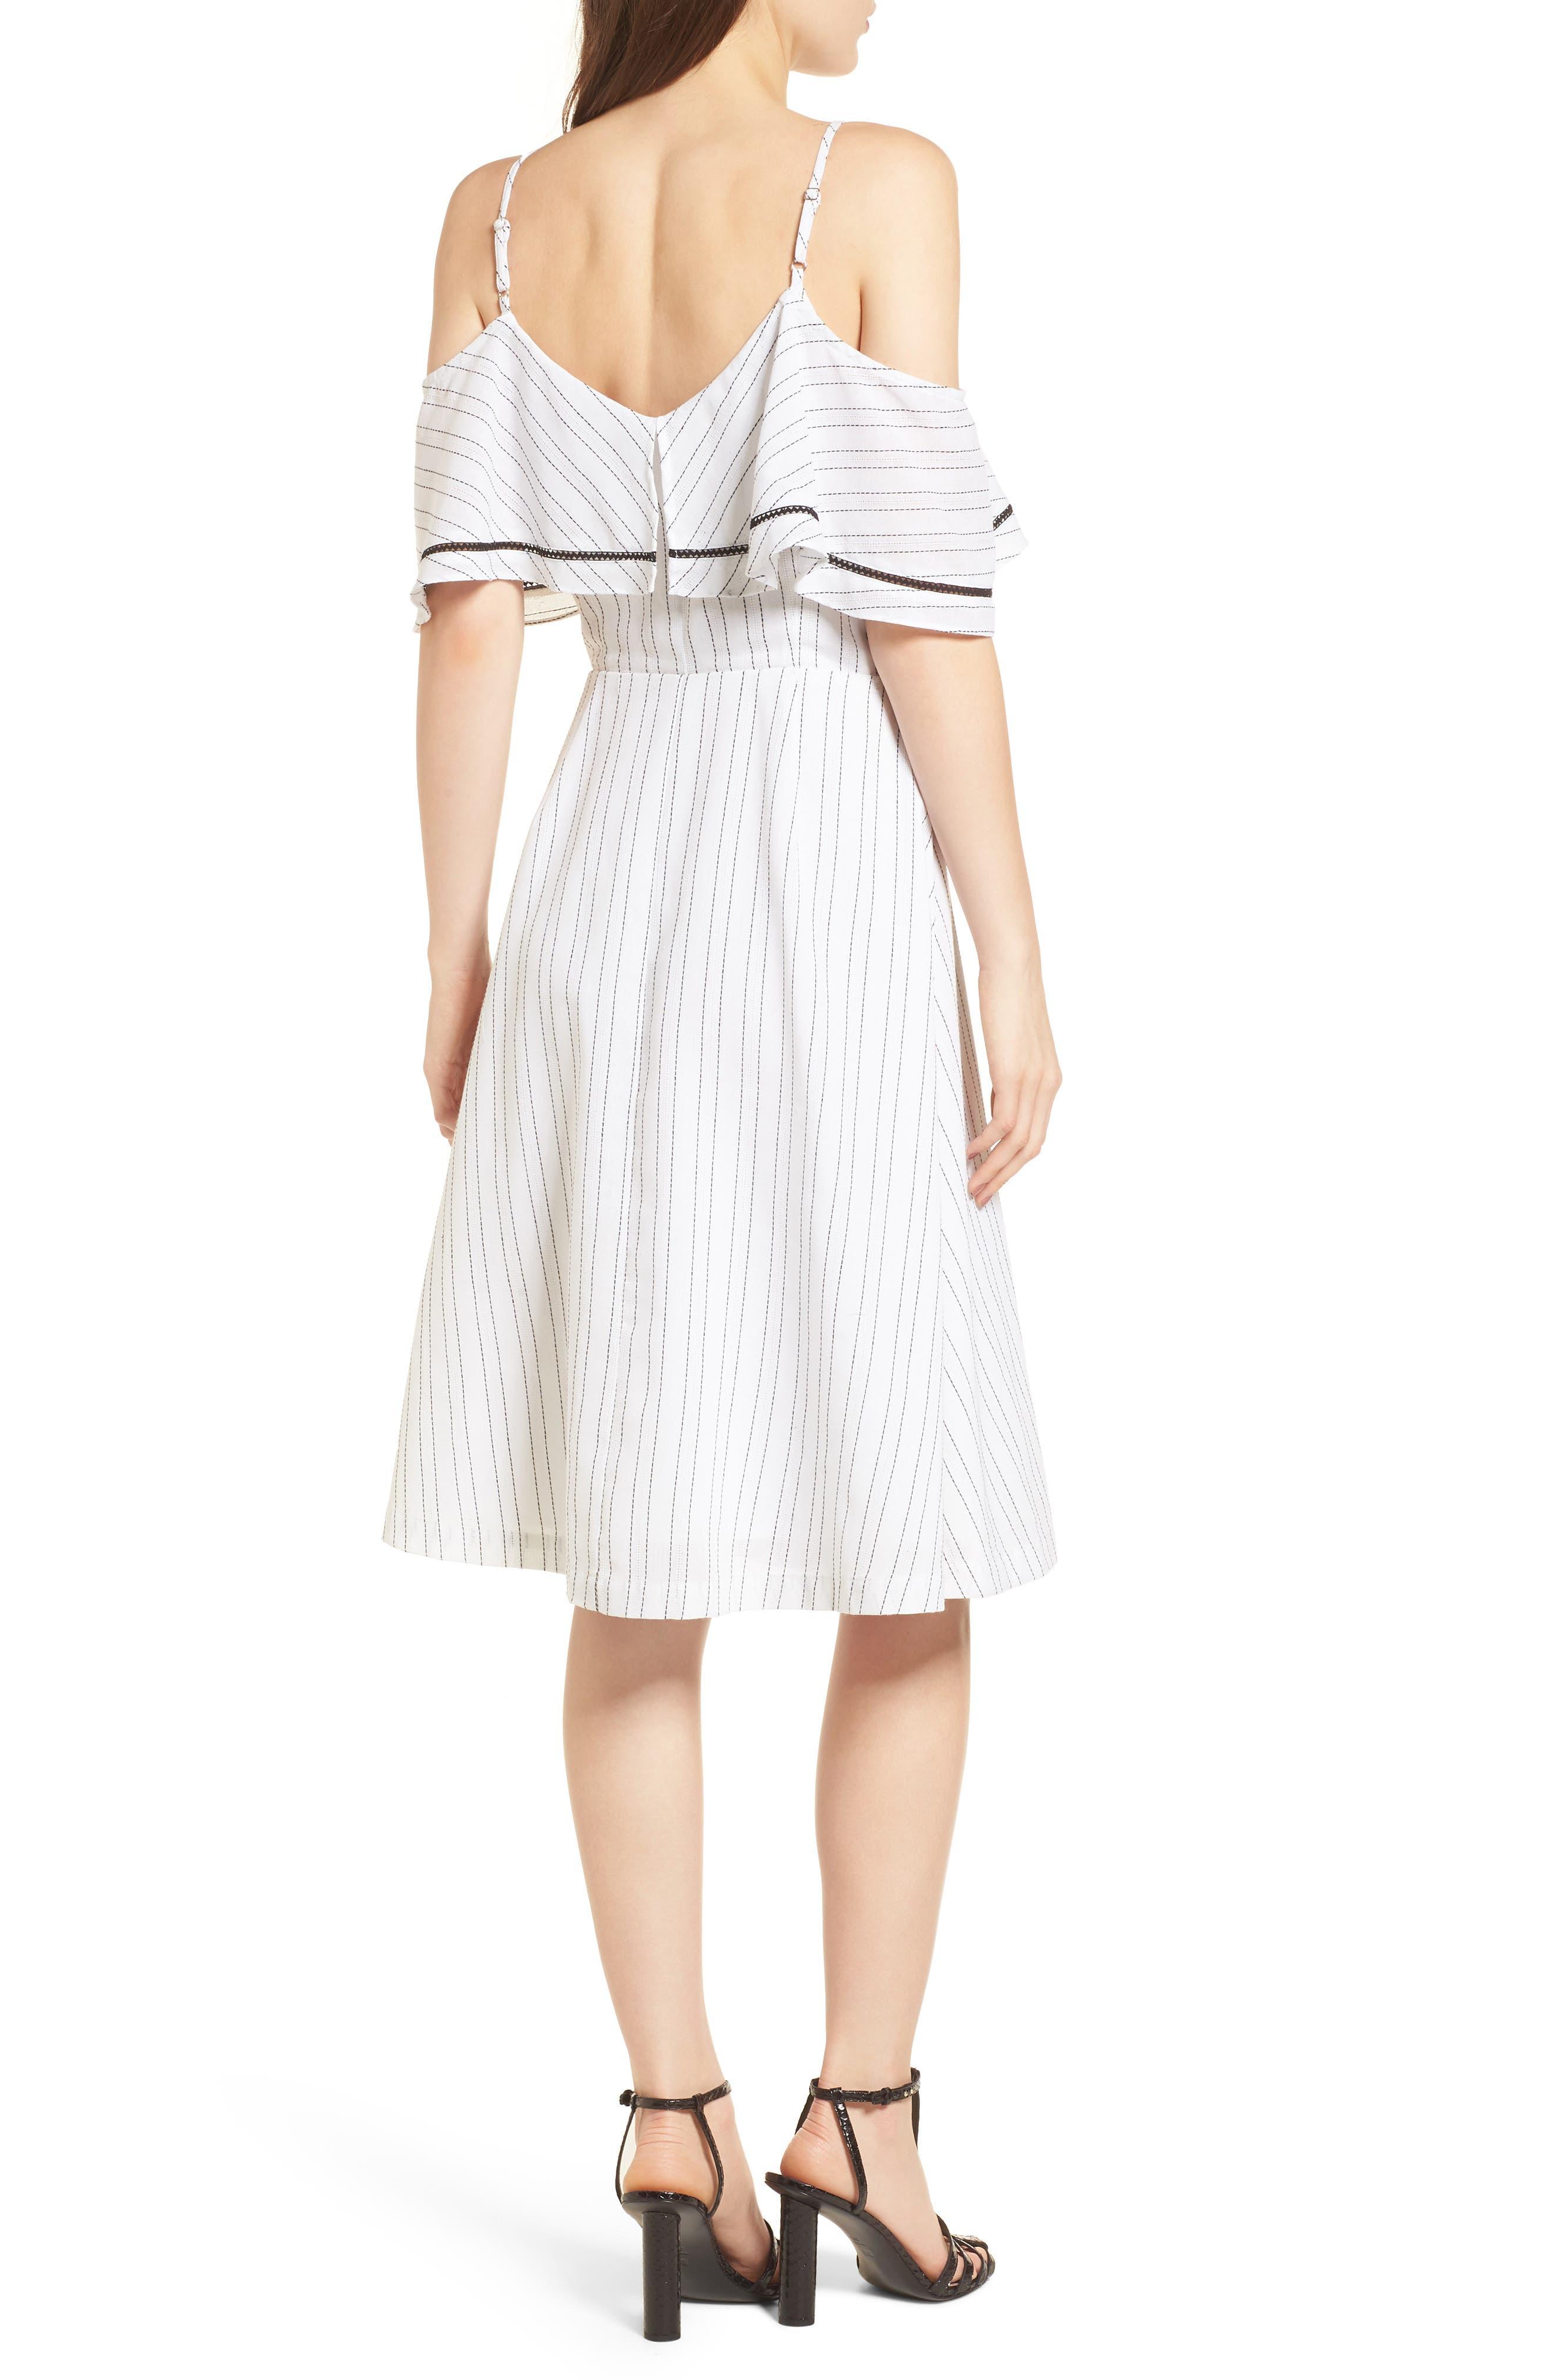 Cold Shoulder Midi Dress,                             Alternate thumbnail 3, color,                             White/ Black